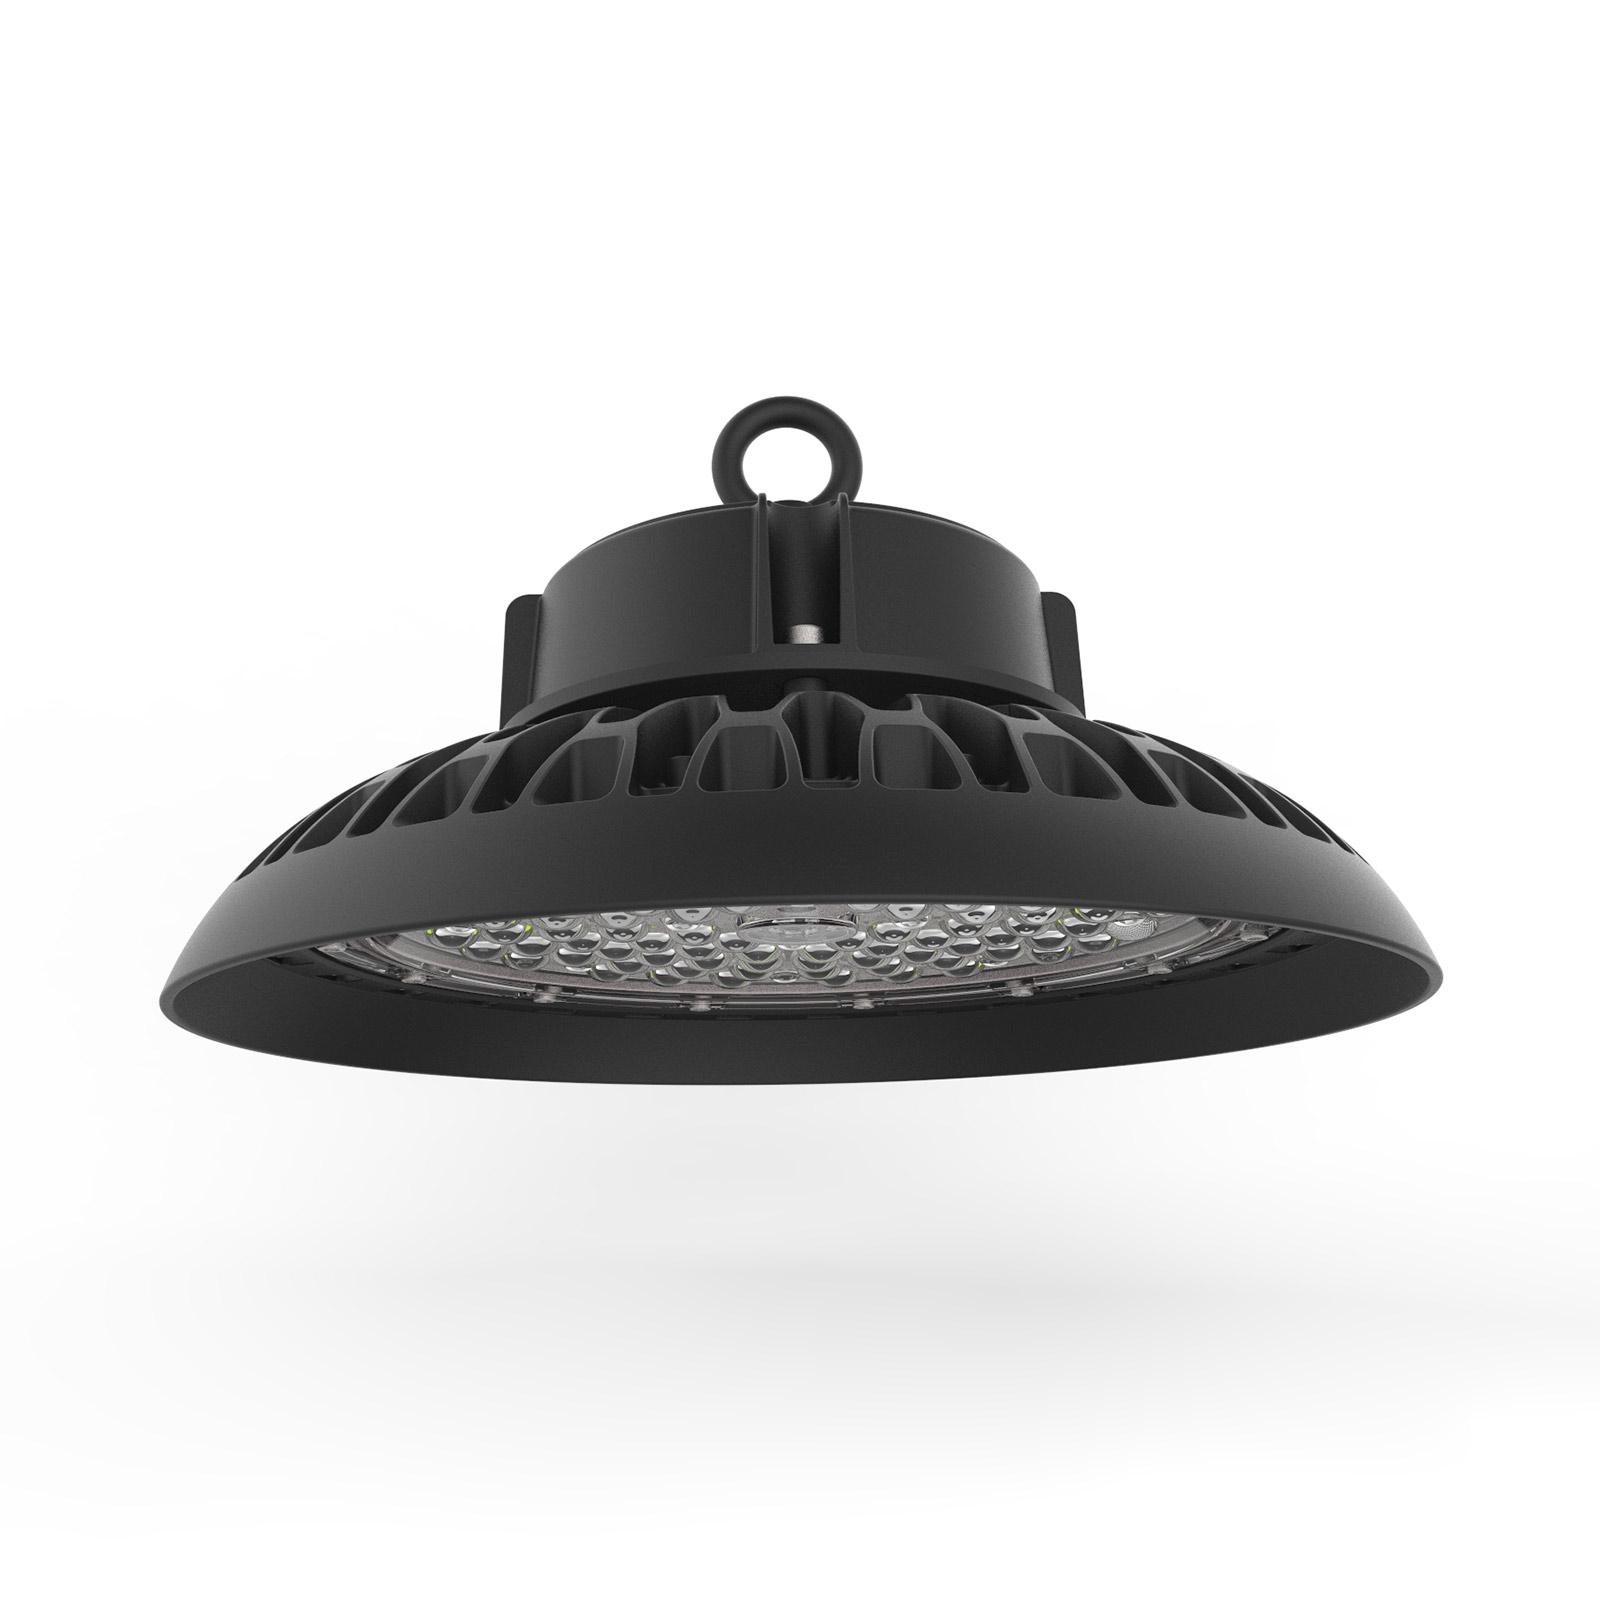 Piccard Pure LED-spotlight til hal, ASW 110° 150 W